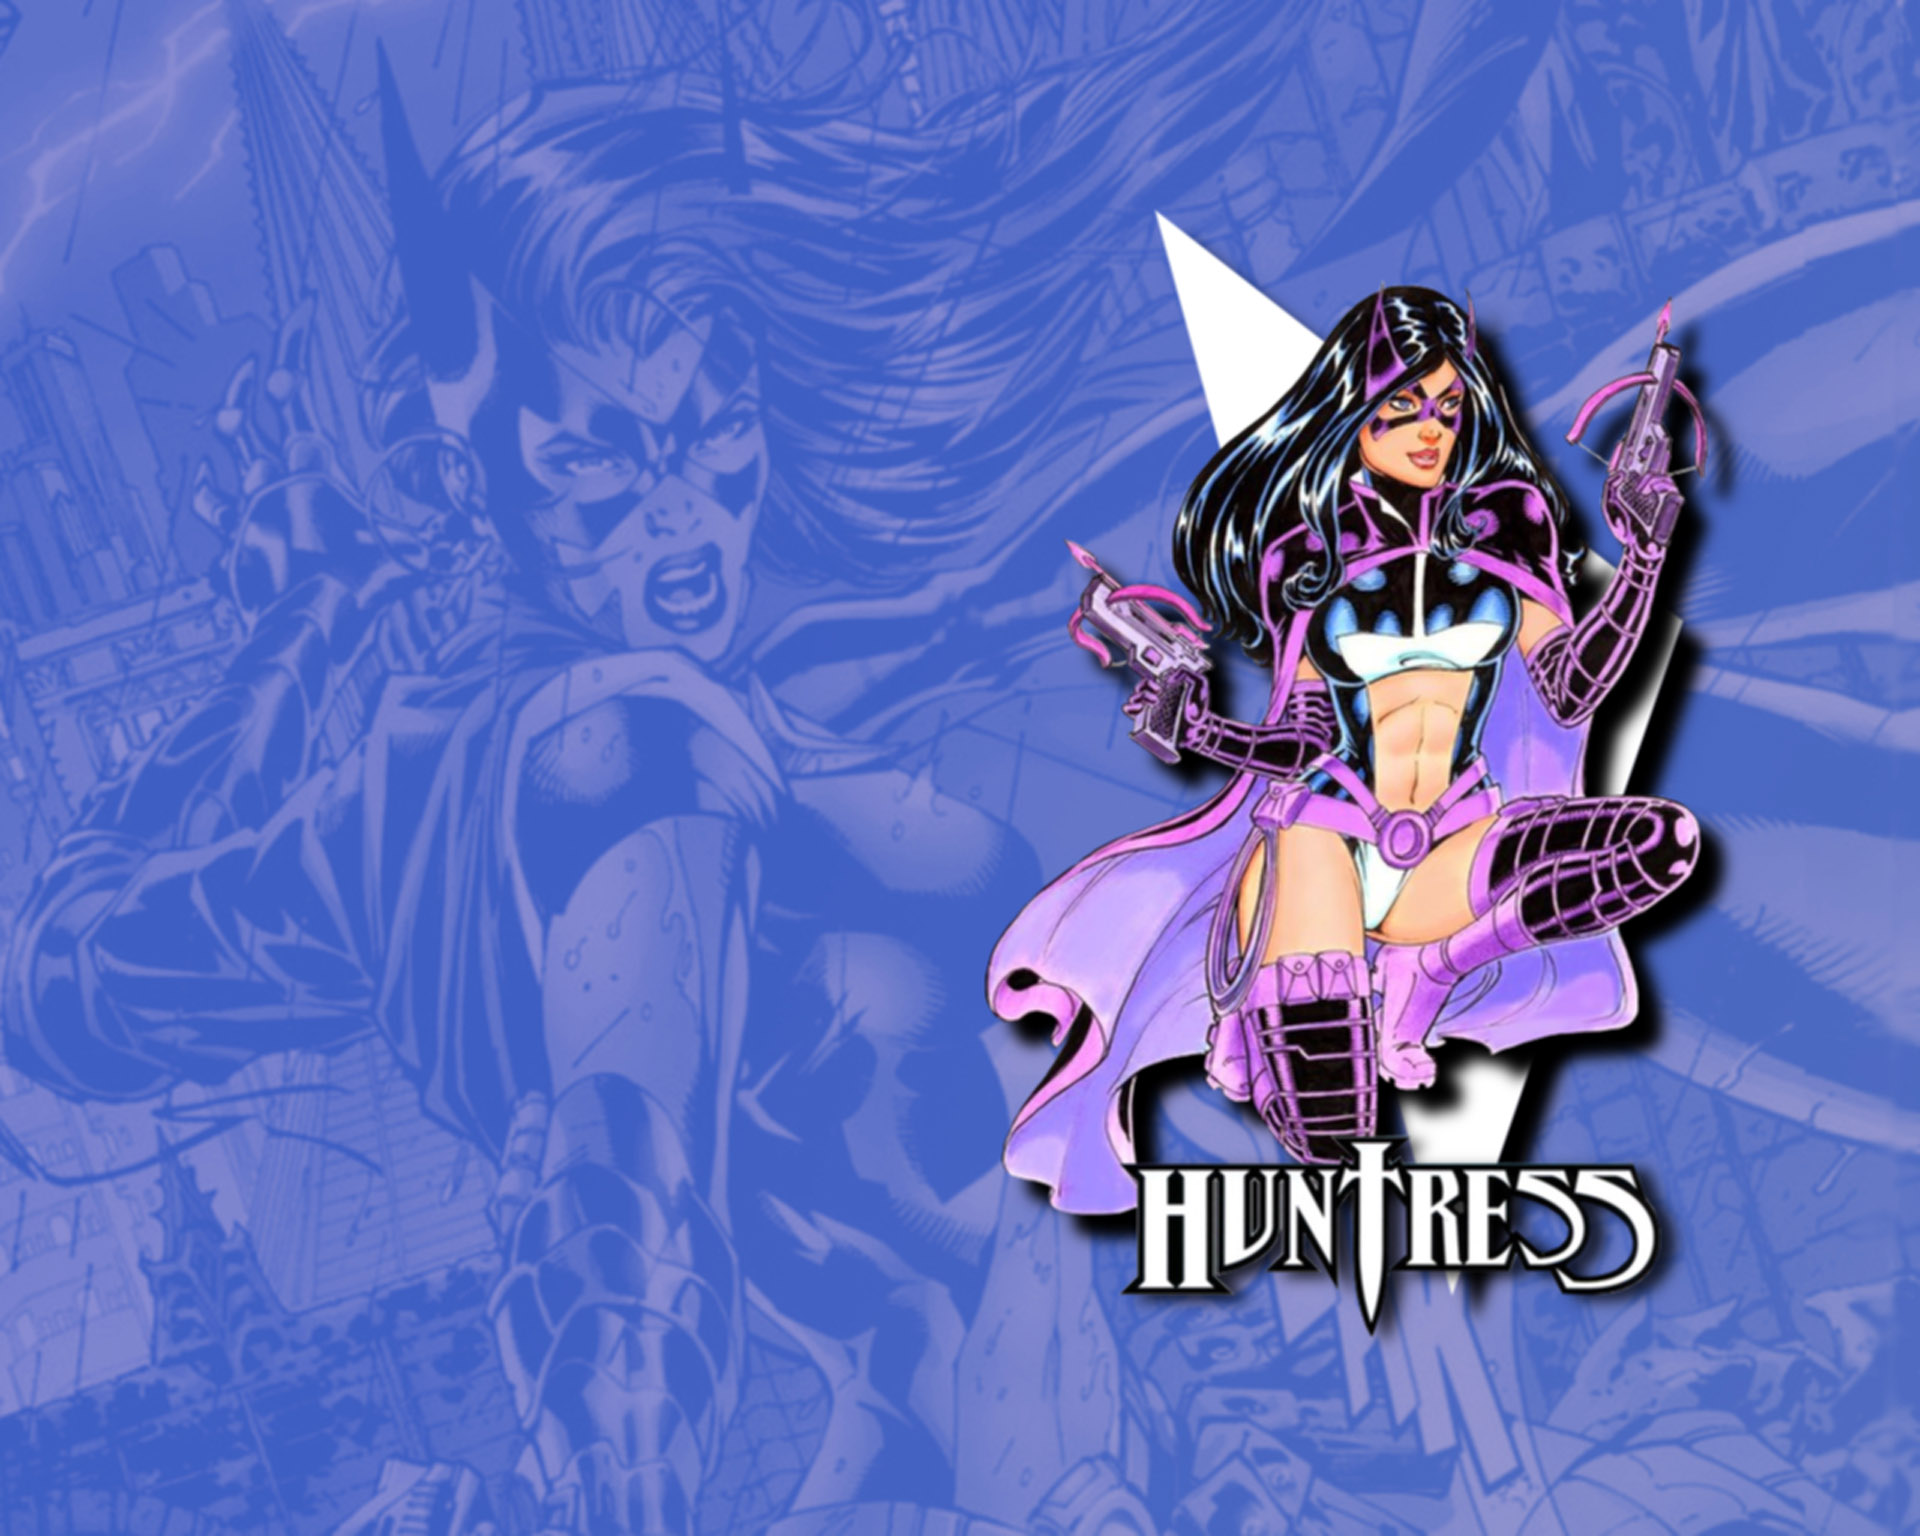 Huntress Wallpaper 13   1920 X 1536 stmednet 1920x1536